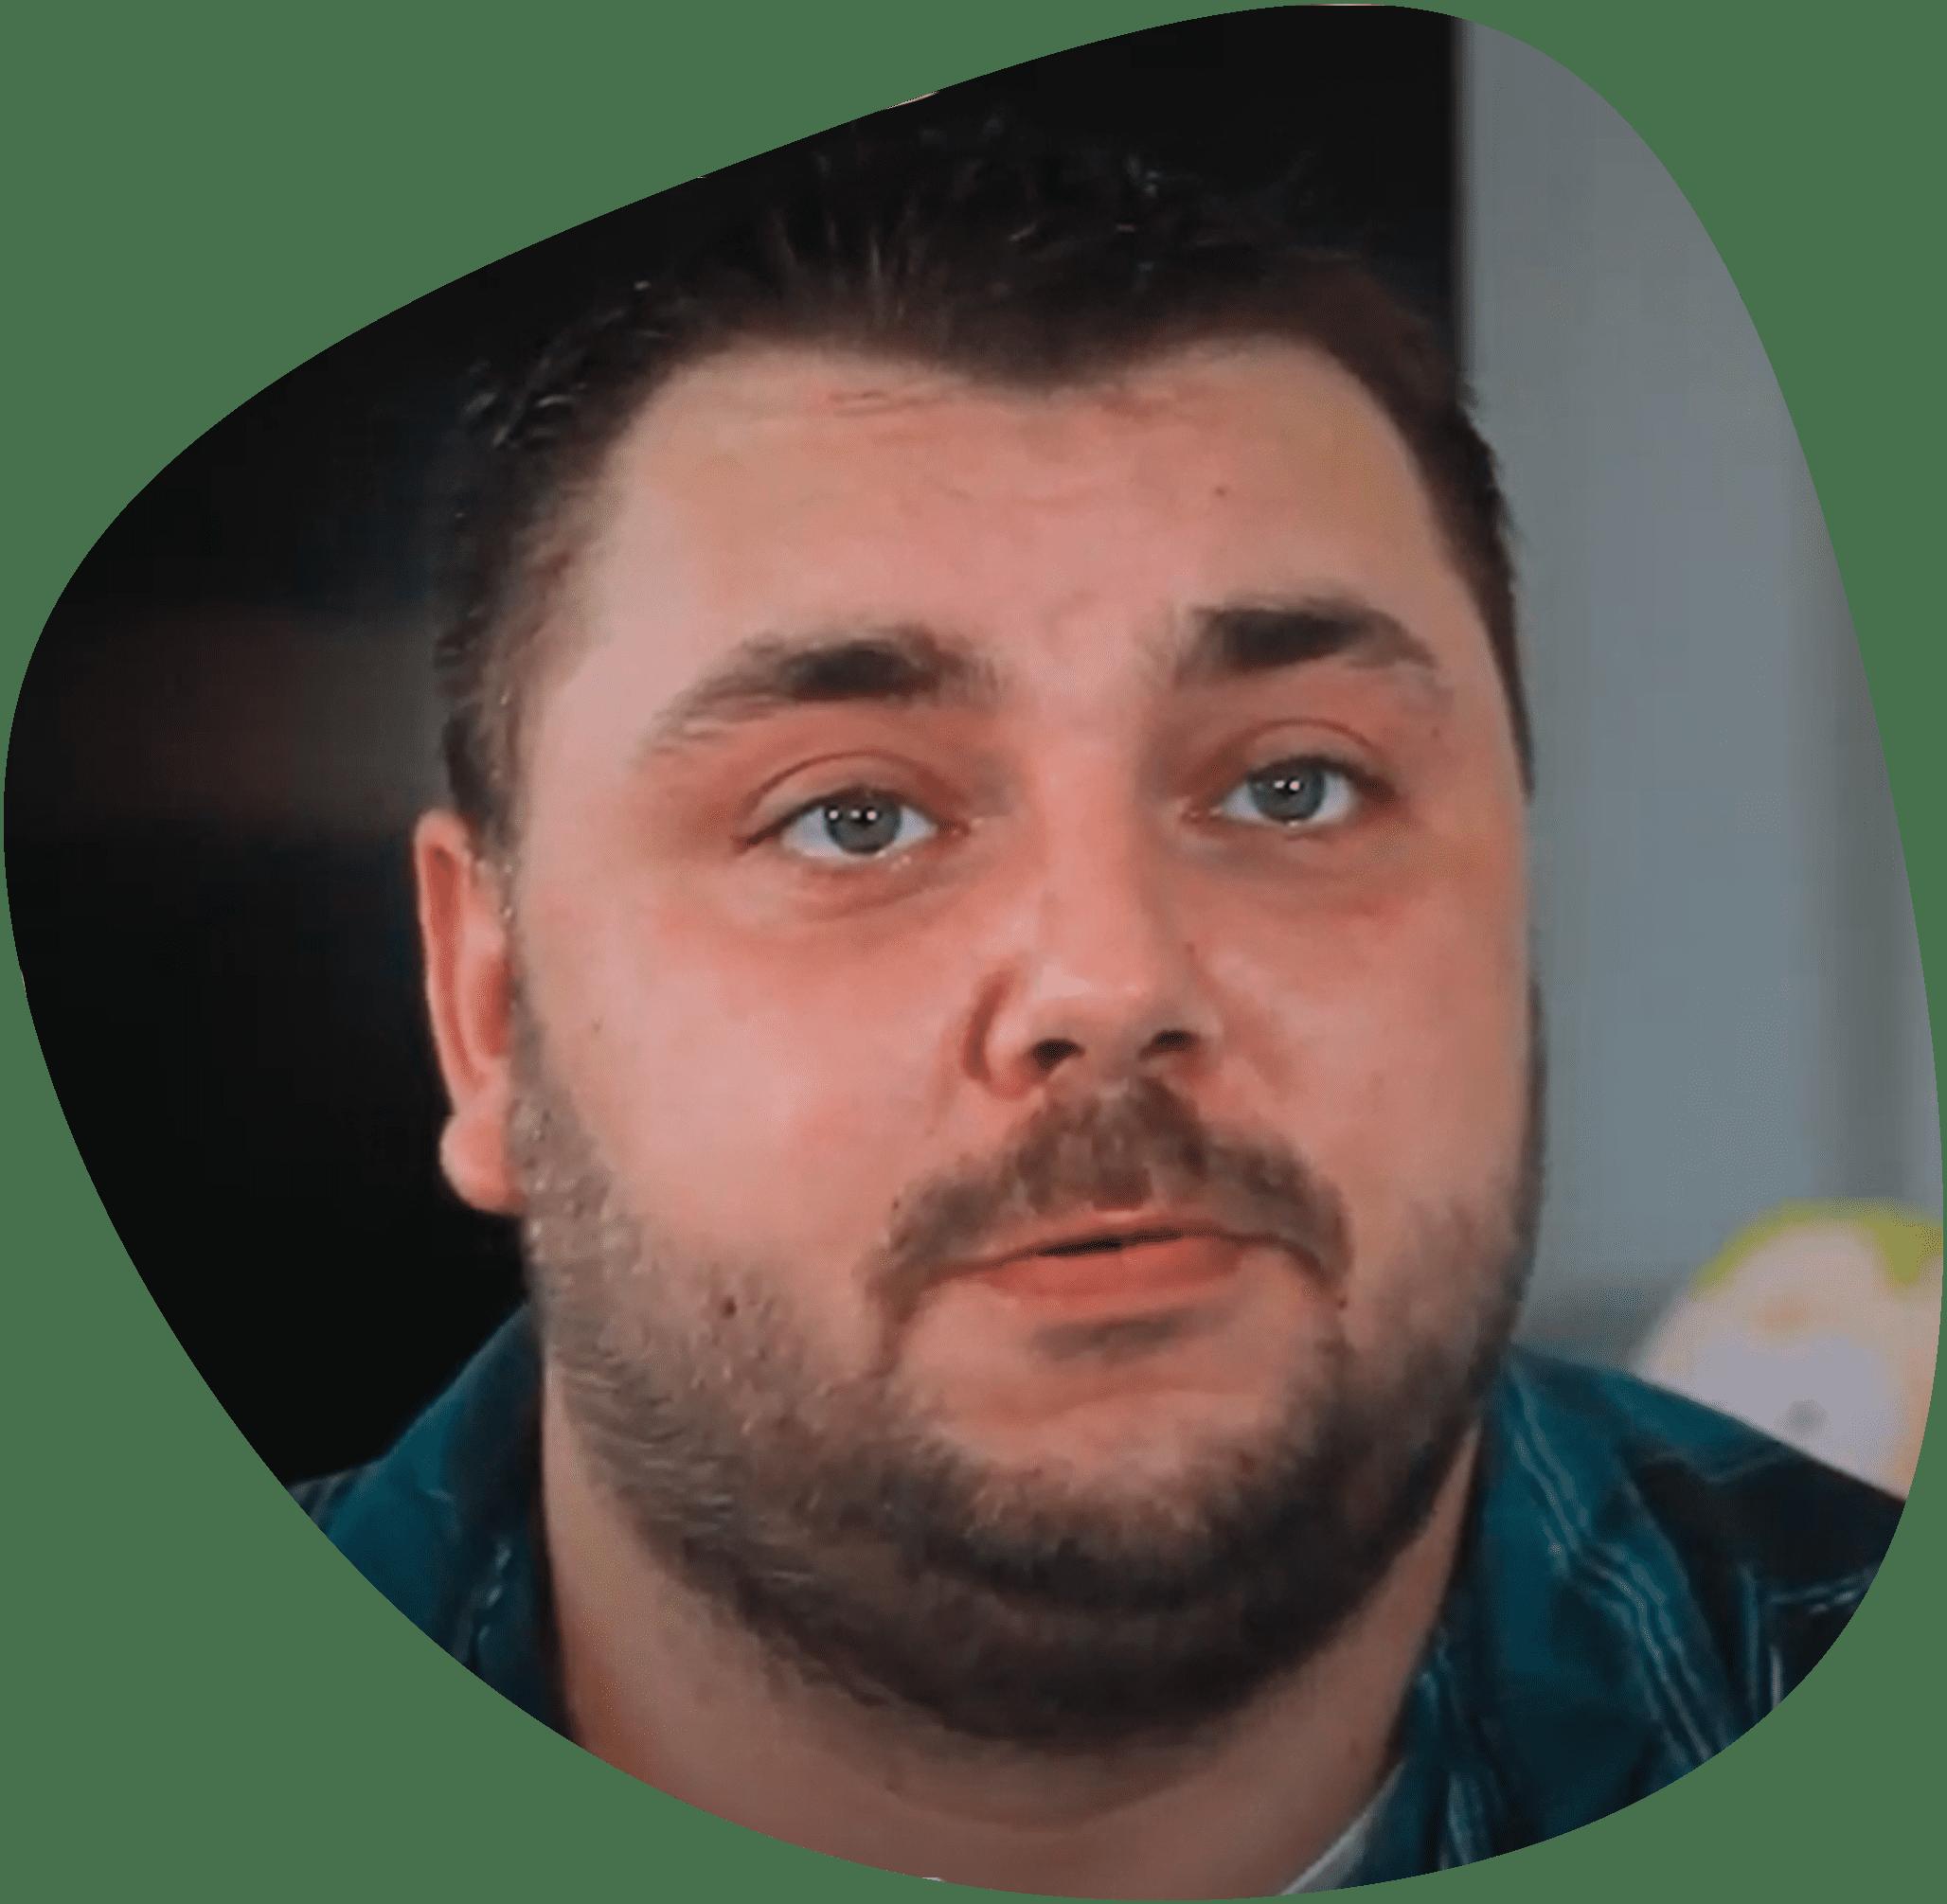 Daniel-testimonial